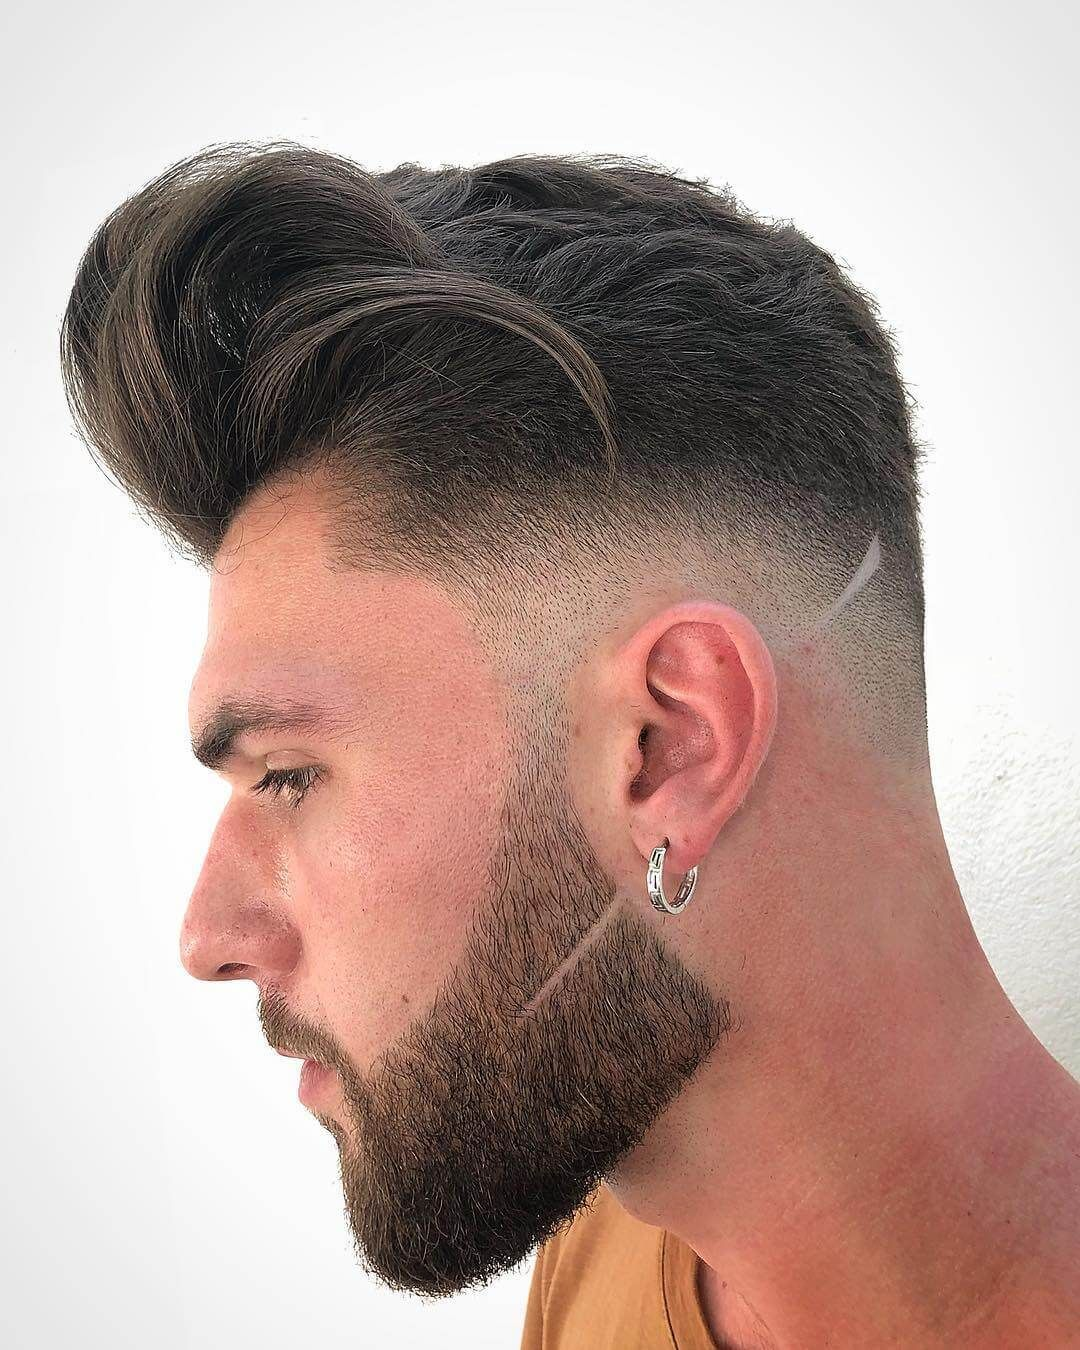 Beardstyles Mensbeardstyle New Beard Style 2019 Indian Short Beard Styles 2019 New Beard Style Beard Hairstyle Beard Styles For Men Hair And Beard Styles